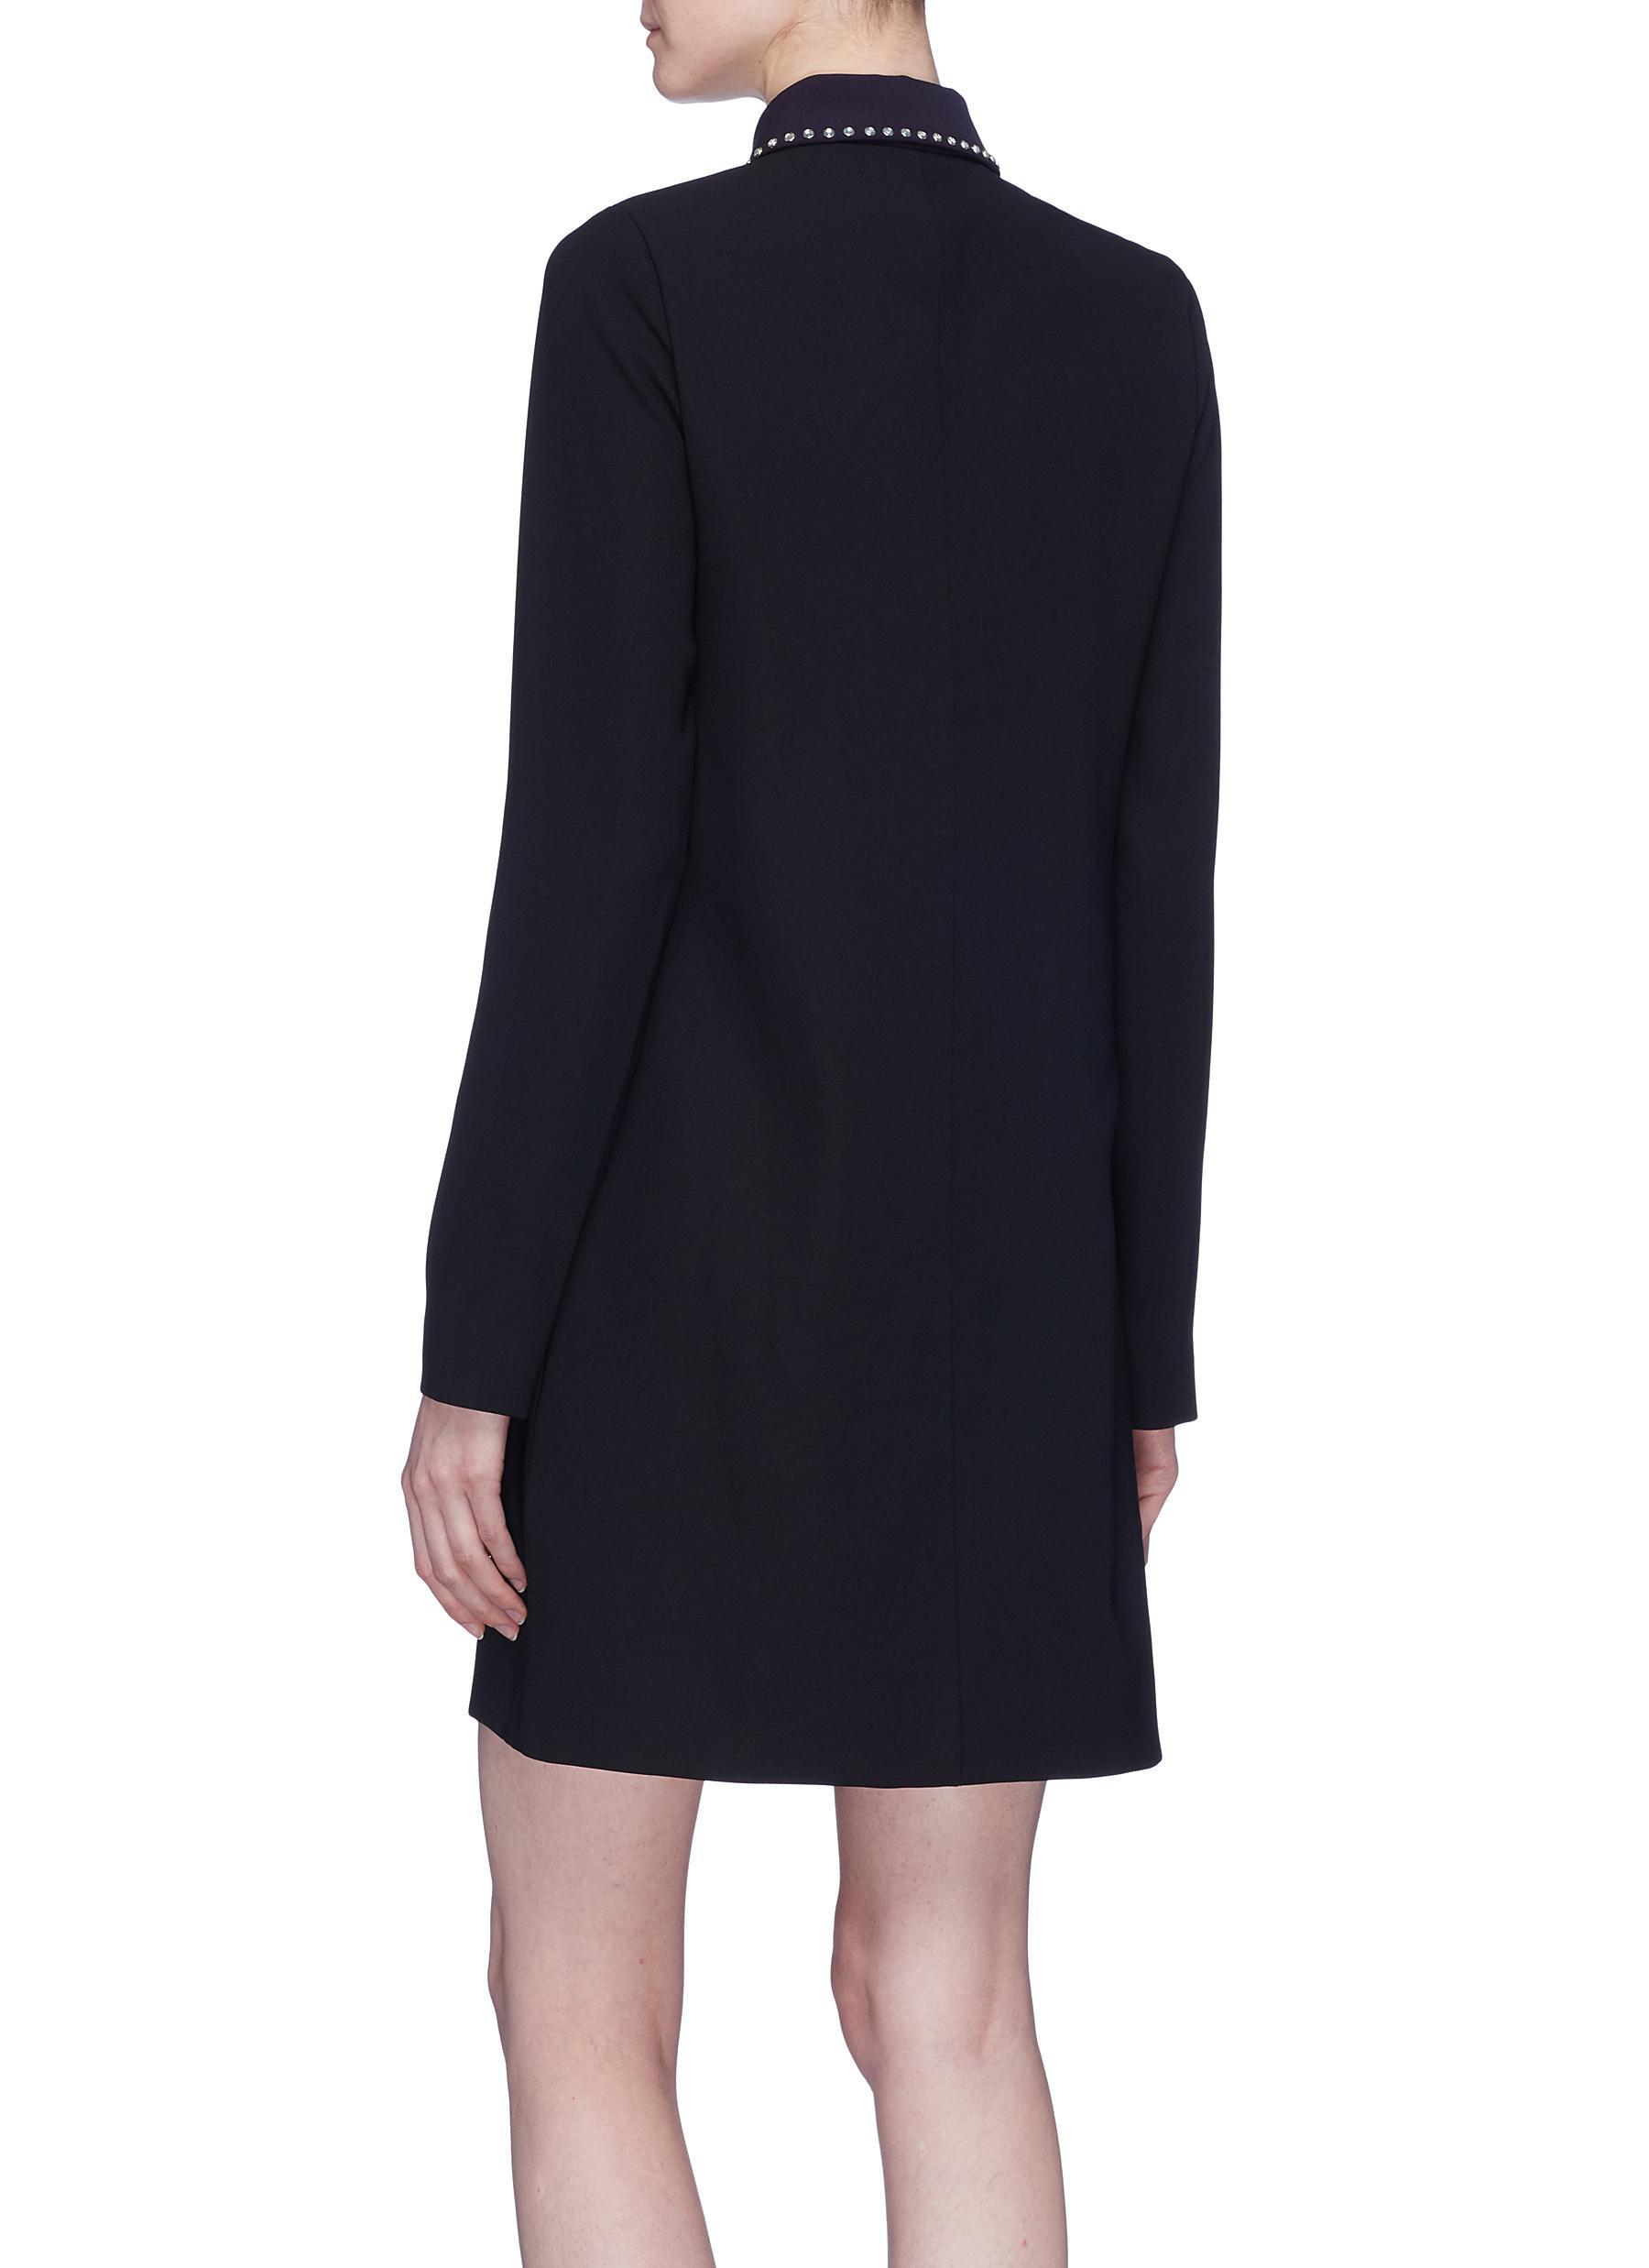 studded keyhole shirt dress - Black Victoria Beckham aXETT